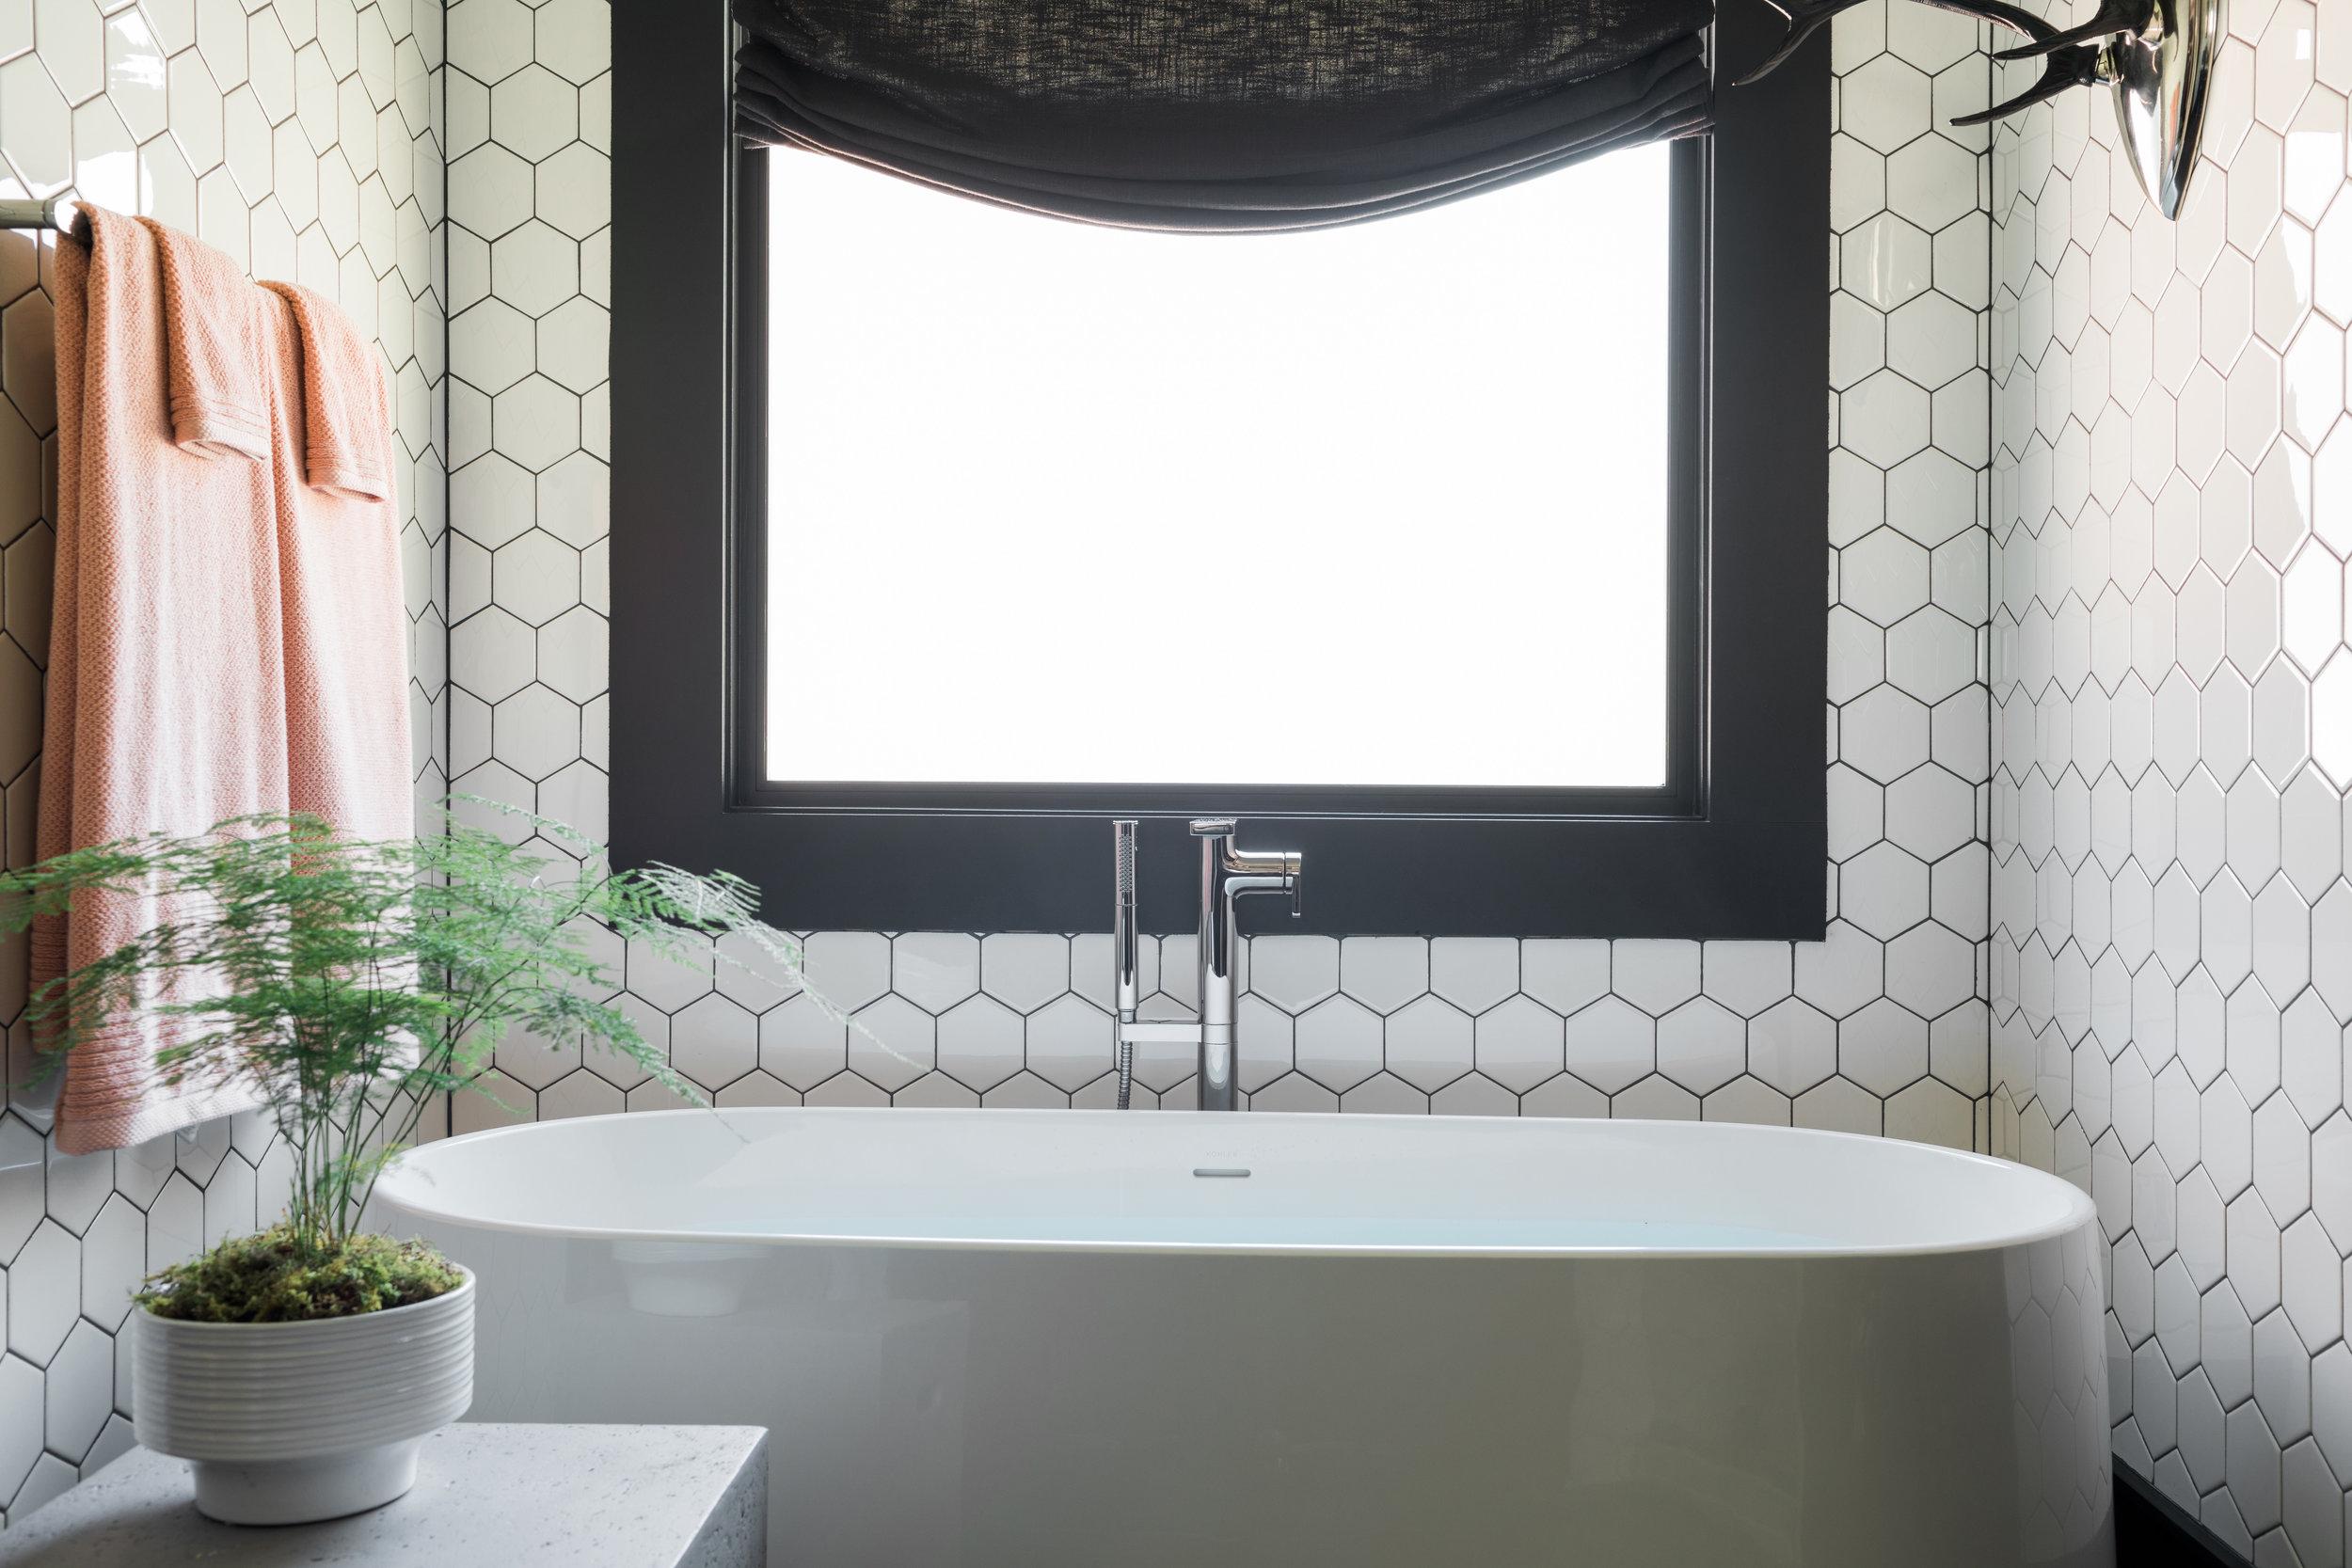 HGTV Urban Oasis 2017 - Master Bathroom with Tub.jpg